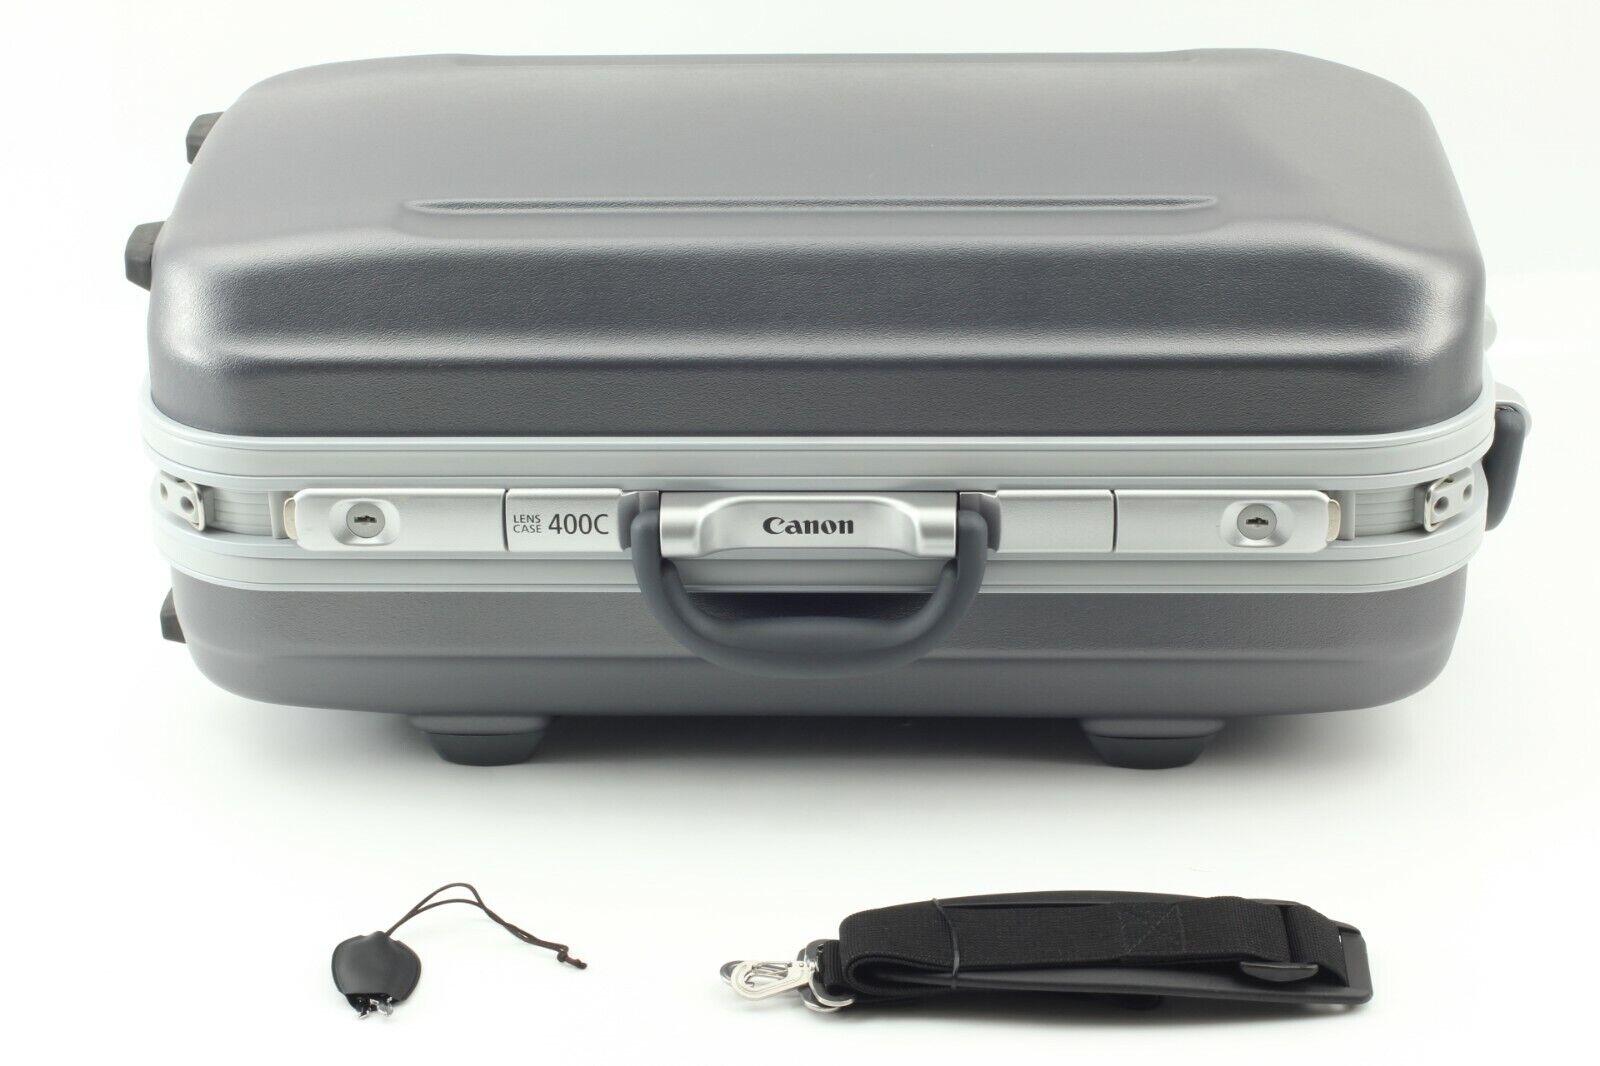 【MINT】Canon Lens Case 400C for EF 400mm F/2.8L IS II w/ Strap & Key from JAPAN